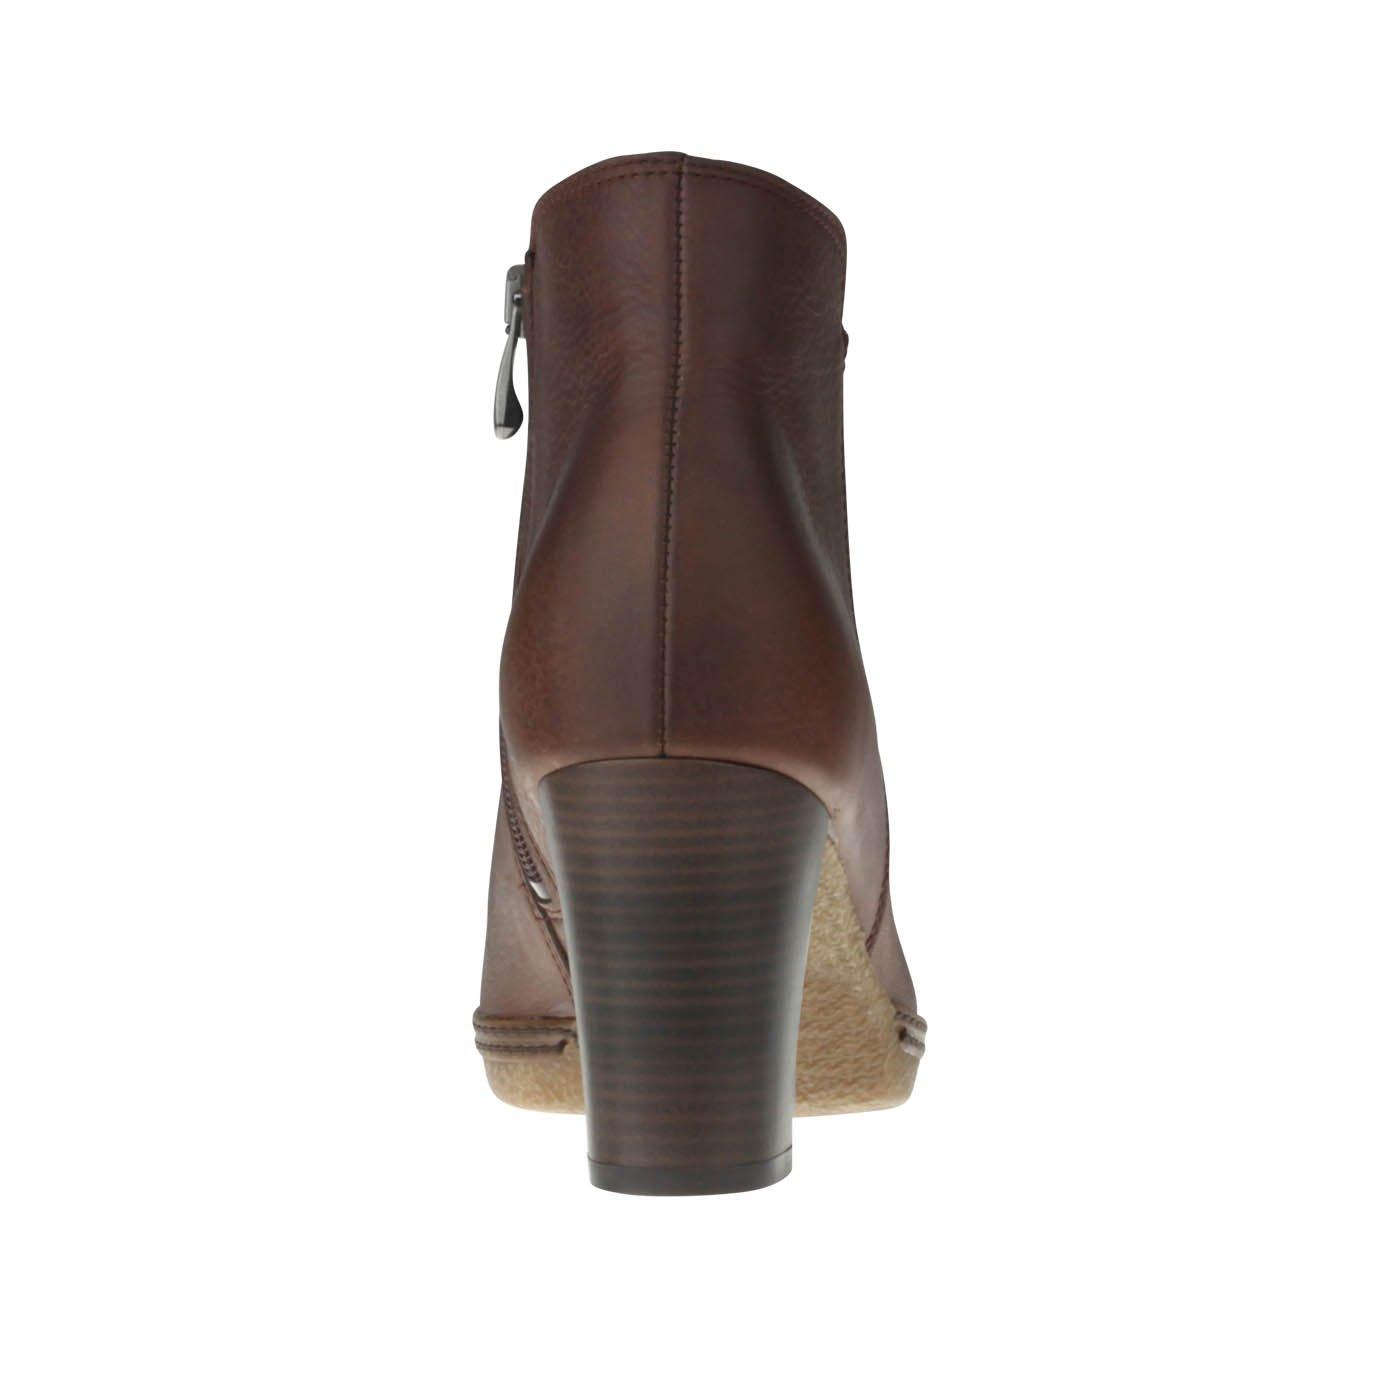 Tessamino Damen Stiefelette   aus Echtleder     mit Lederfußbett   Warmfutter 05a95f